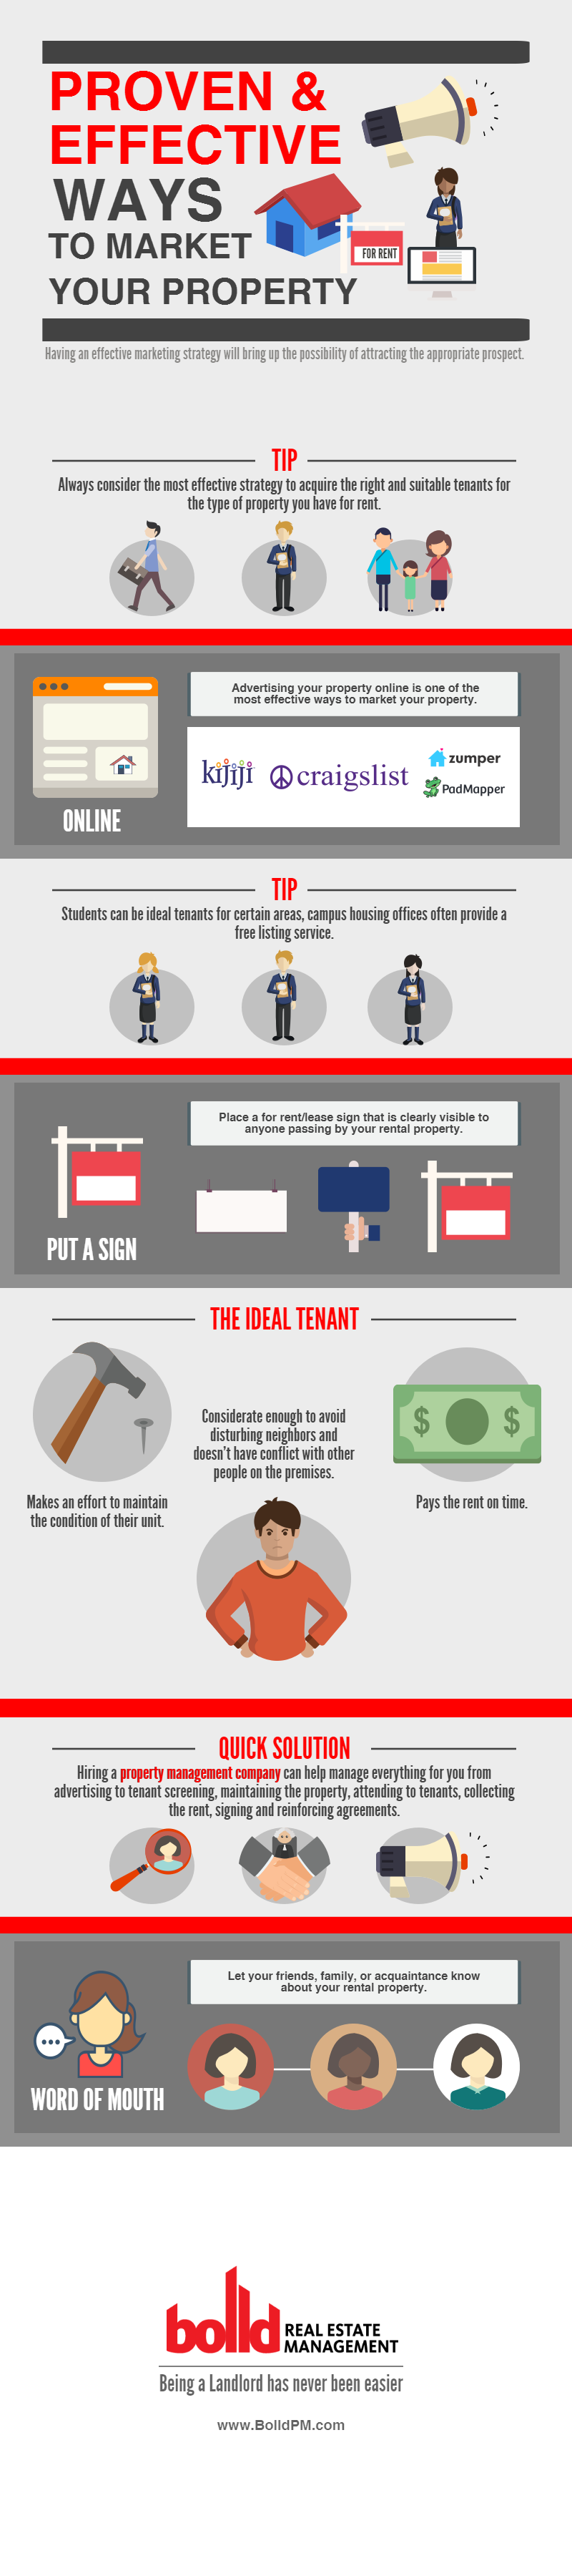 4 Effective Ways To Market Your Rental Unit Bolld Real Estate Management Property Management Marketing Real Estate Management Rental Property Investment